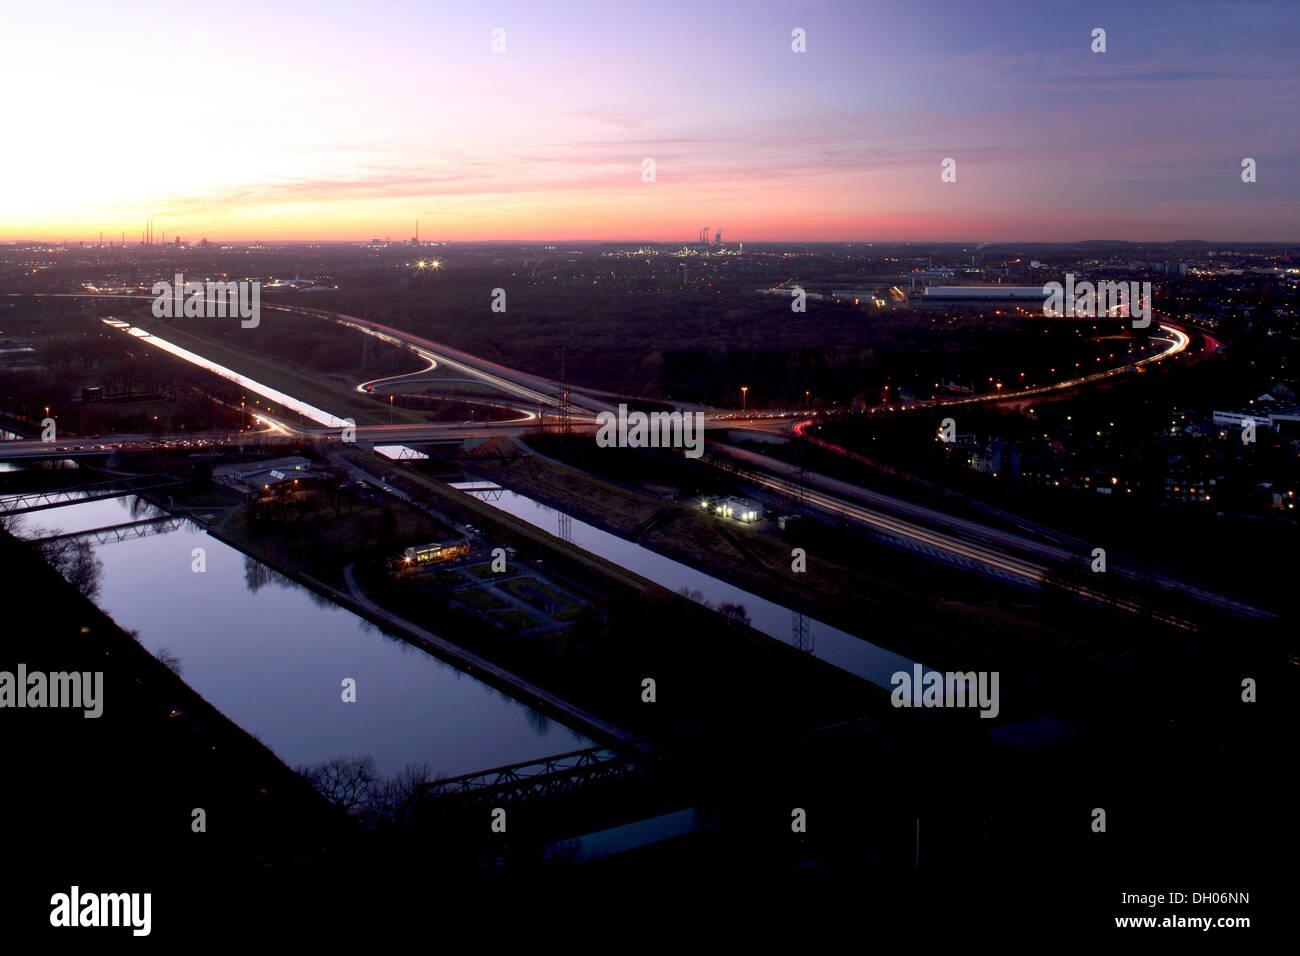 Public highways in the Ruhr area, Rhine-Herne Canal, Emscher, 42 motorway, Oberhausen, Ruhr area, North Rhine-Westphalia - Stock Image